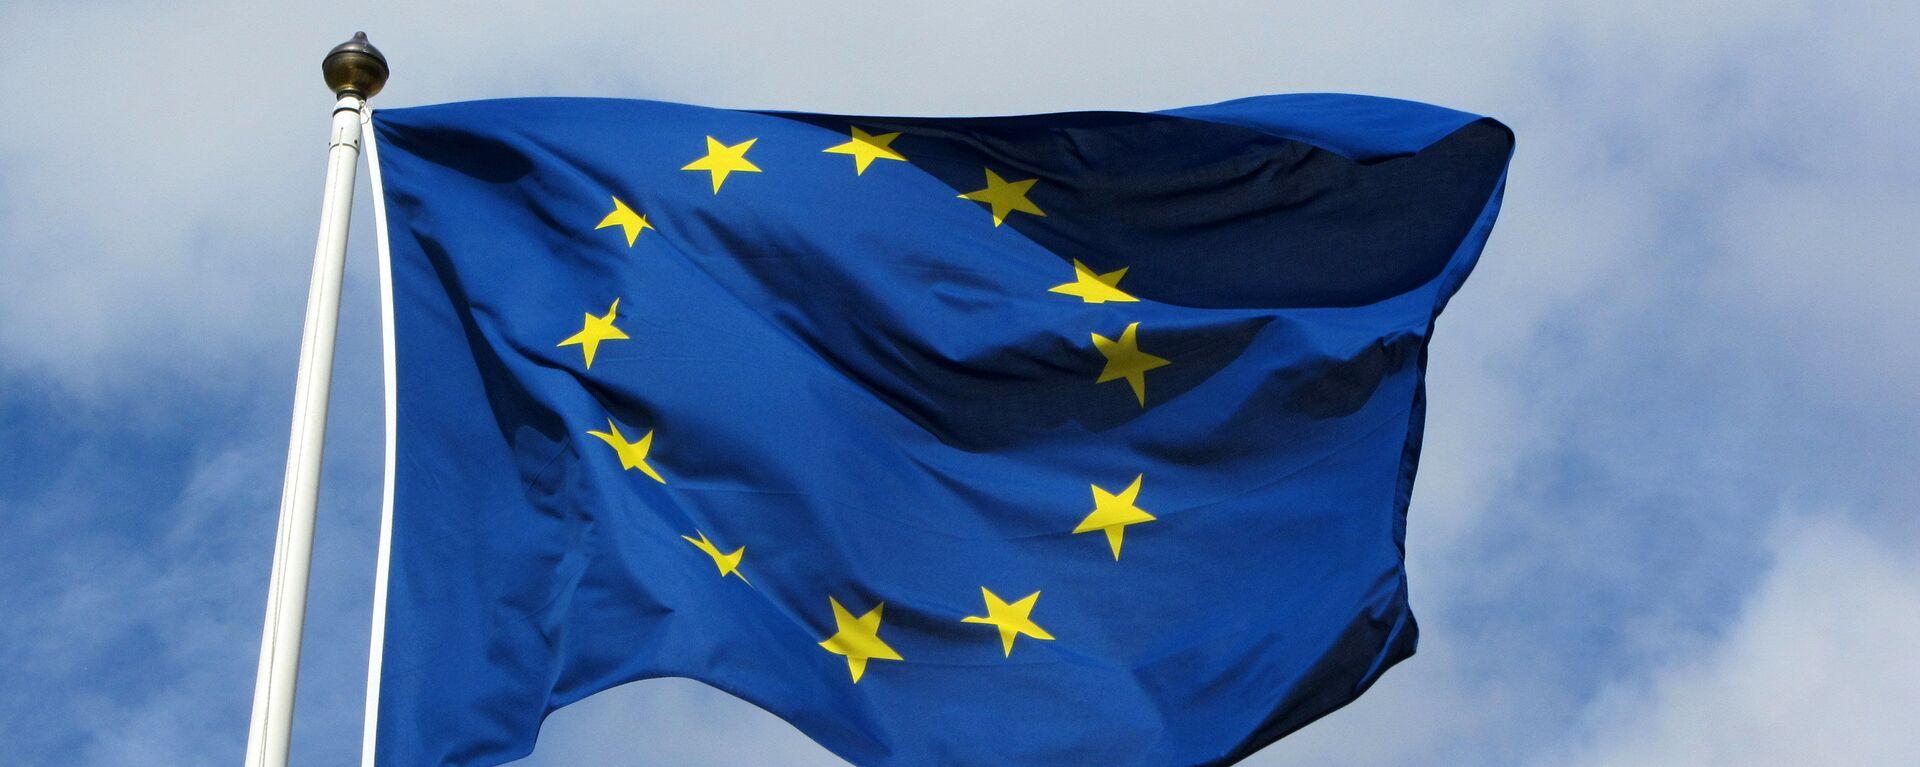 Bandiera Unione Europea - Sputnik Italia, 1920, 30.05.2021